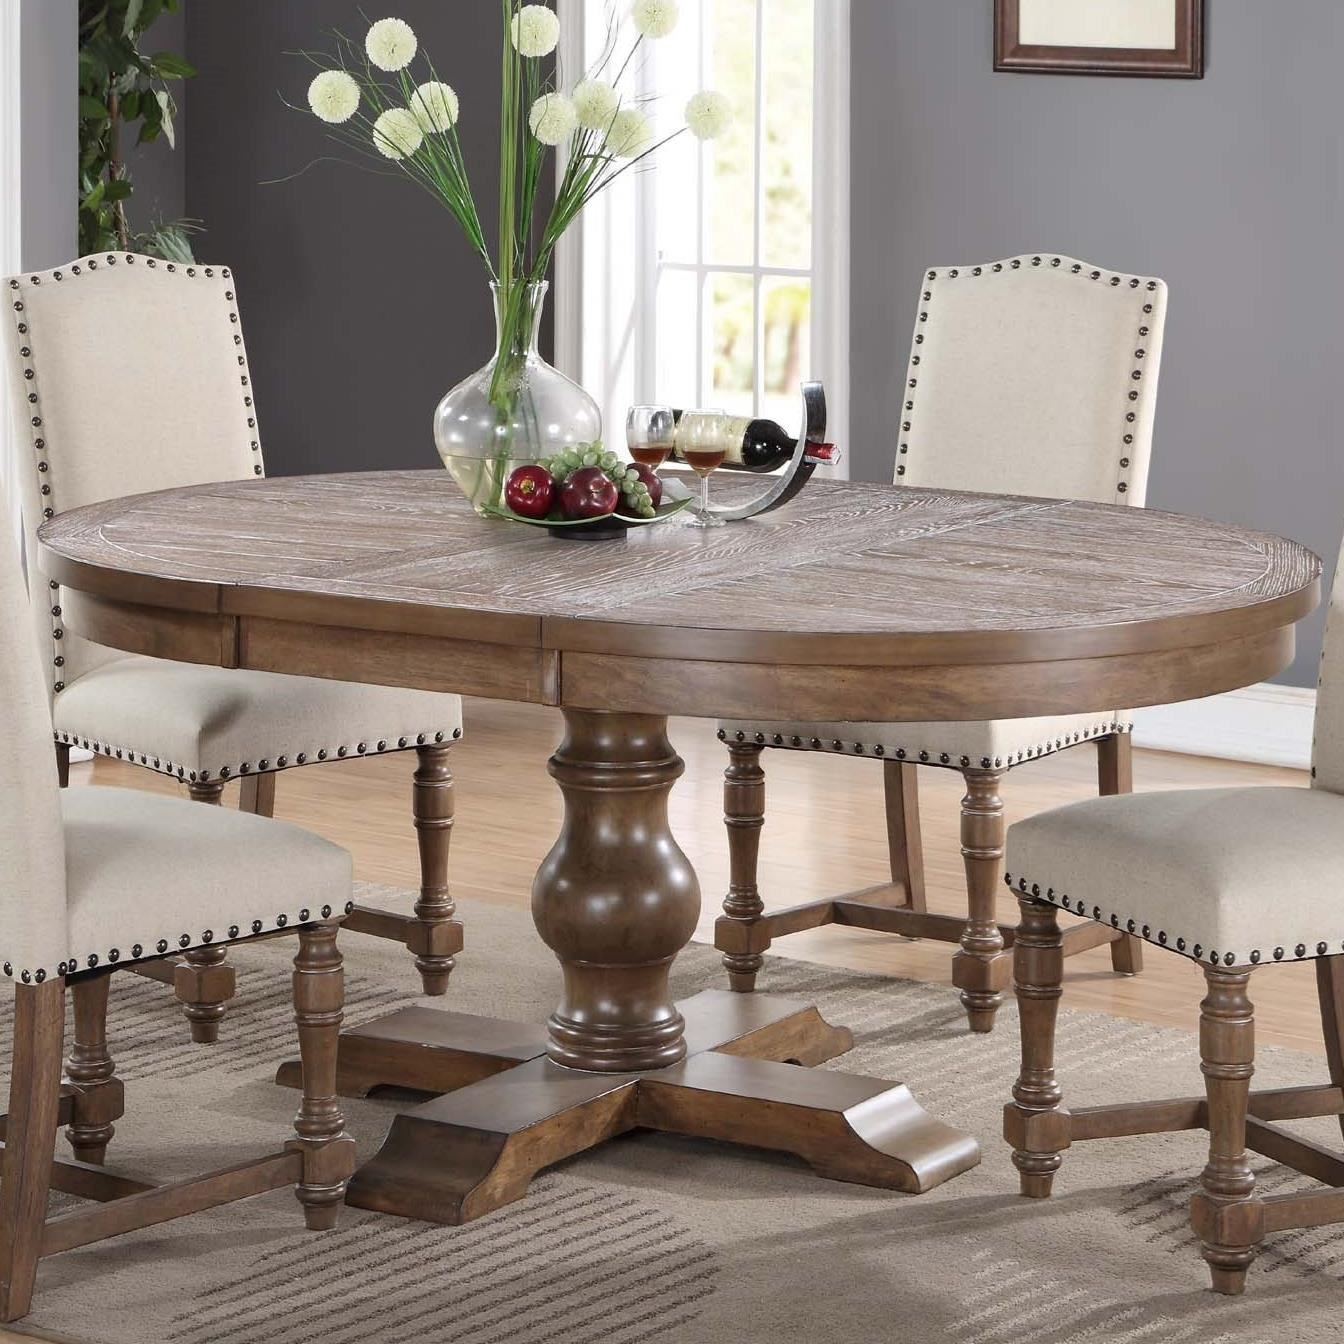 "pedestal dining room table with leaf | Xcalibur Round Pedestal Table with 18"" Leaf | Rotmans ..."